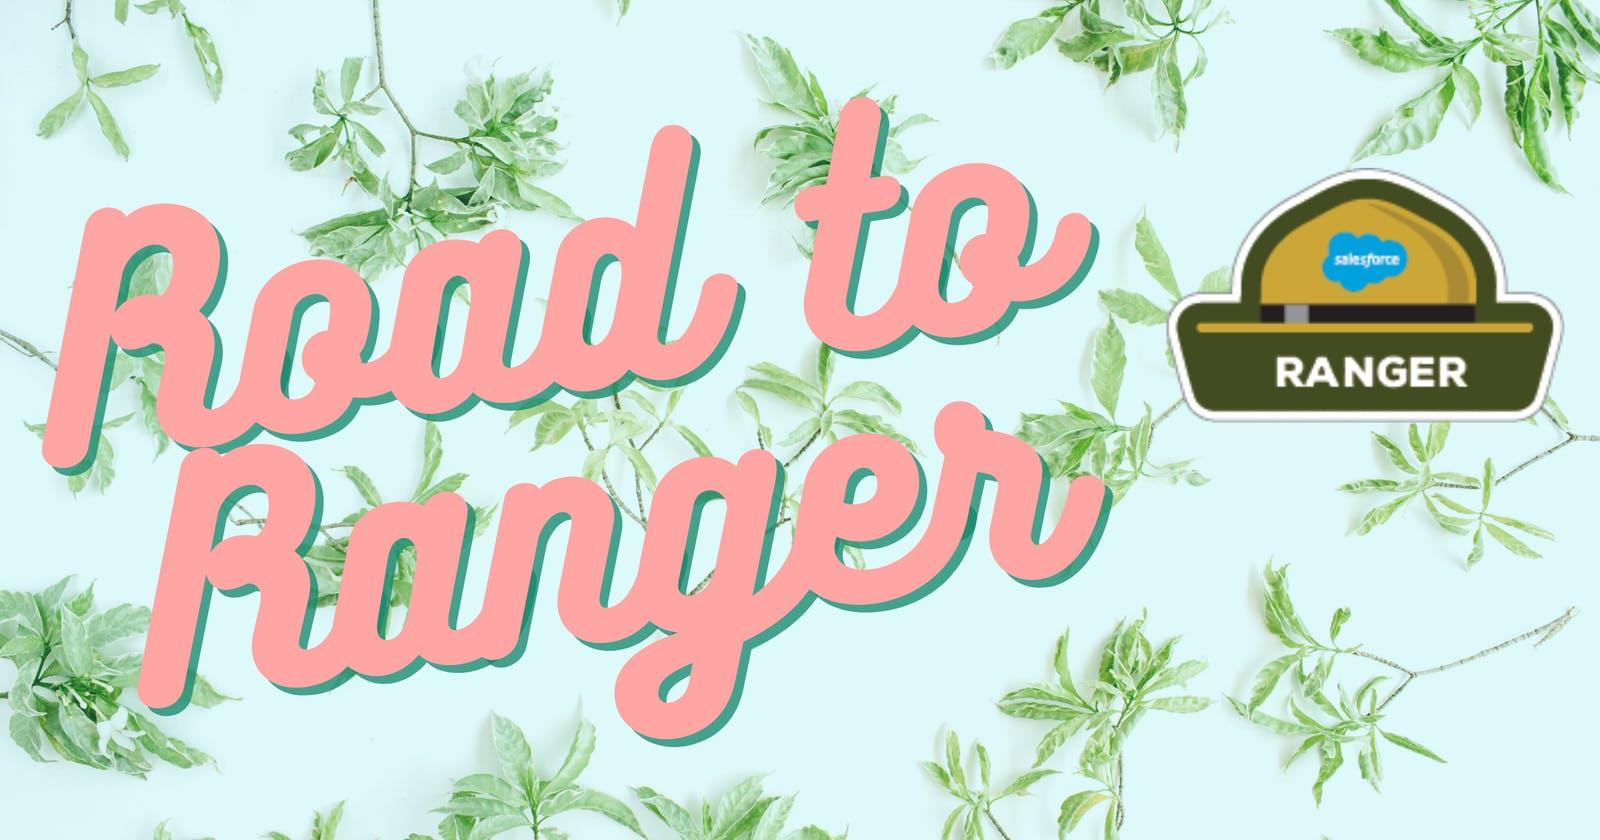 Road to Ranger Challenge